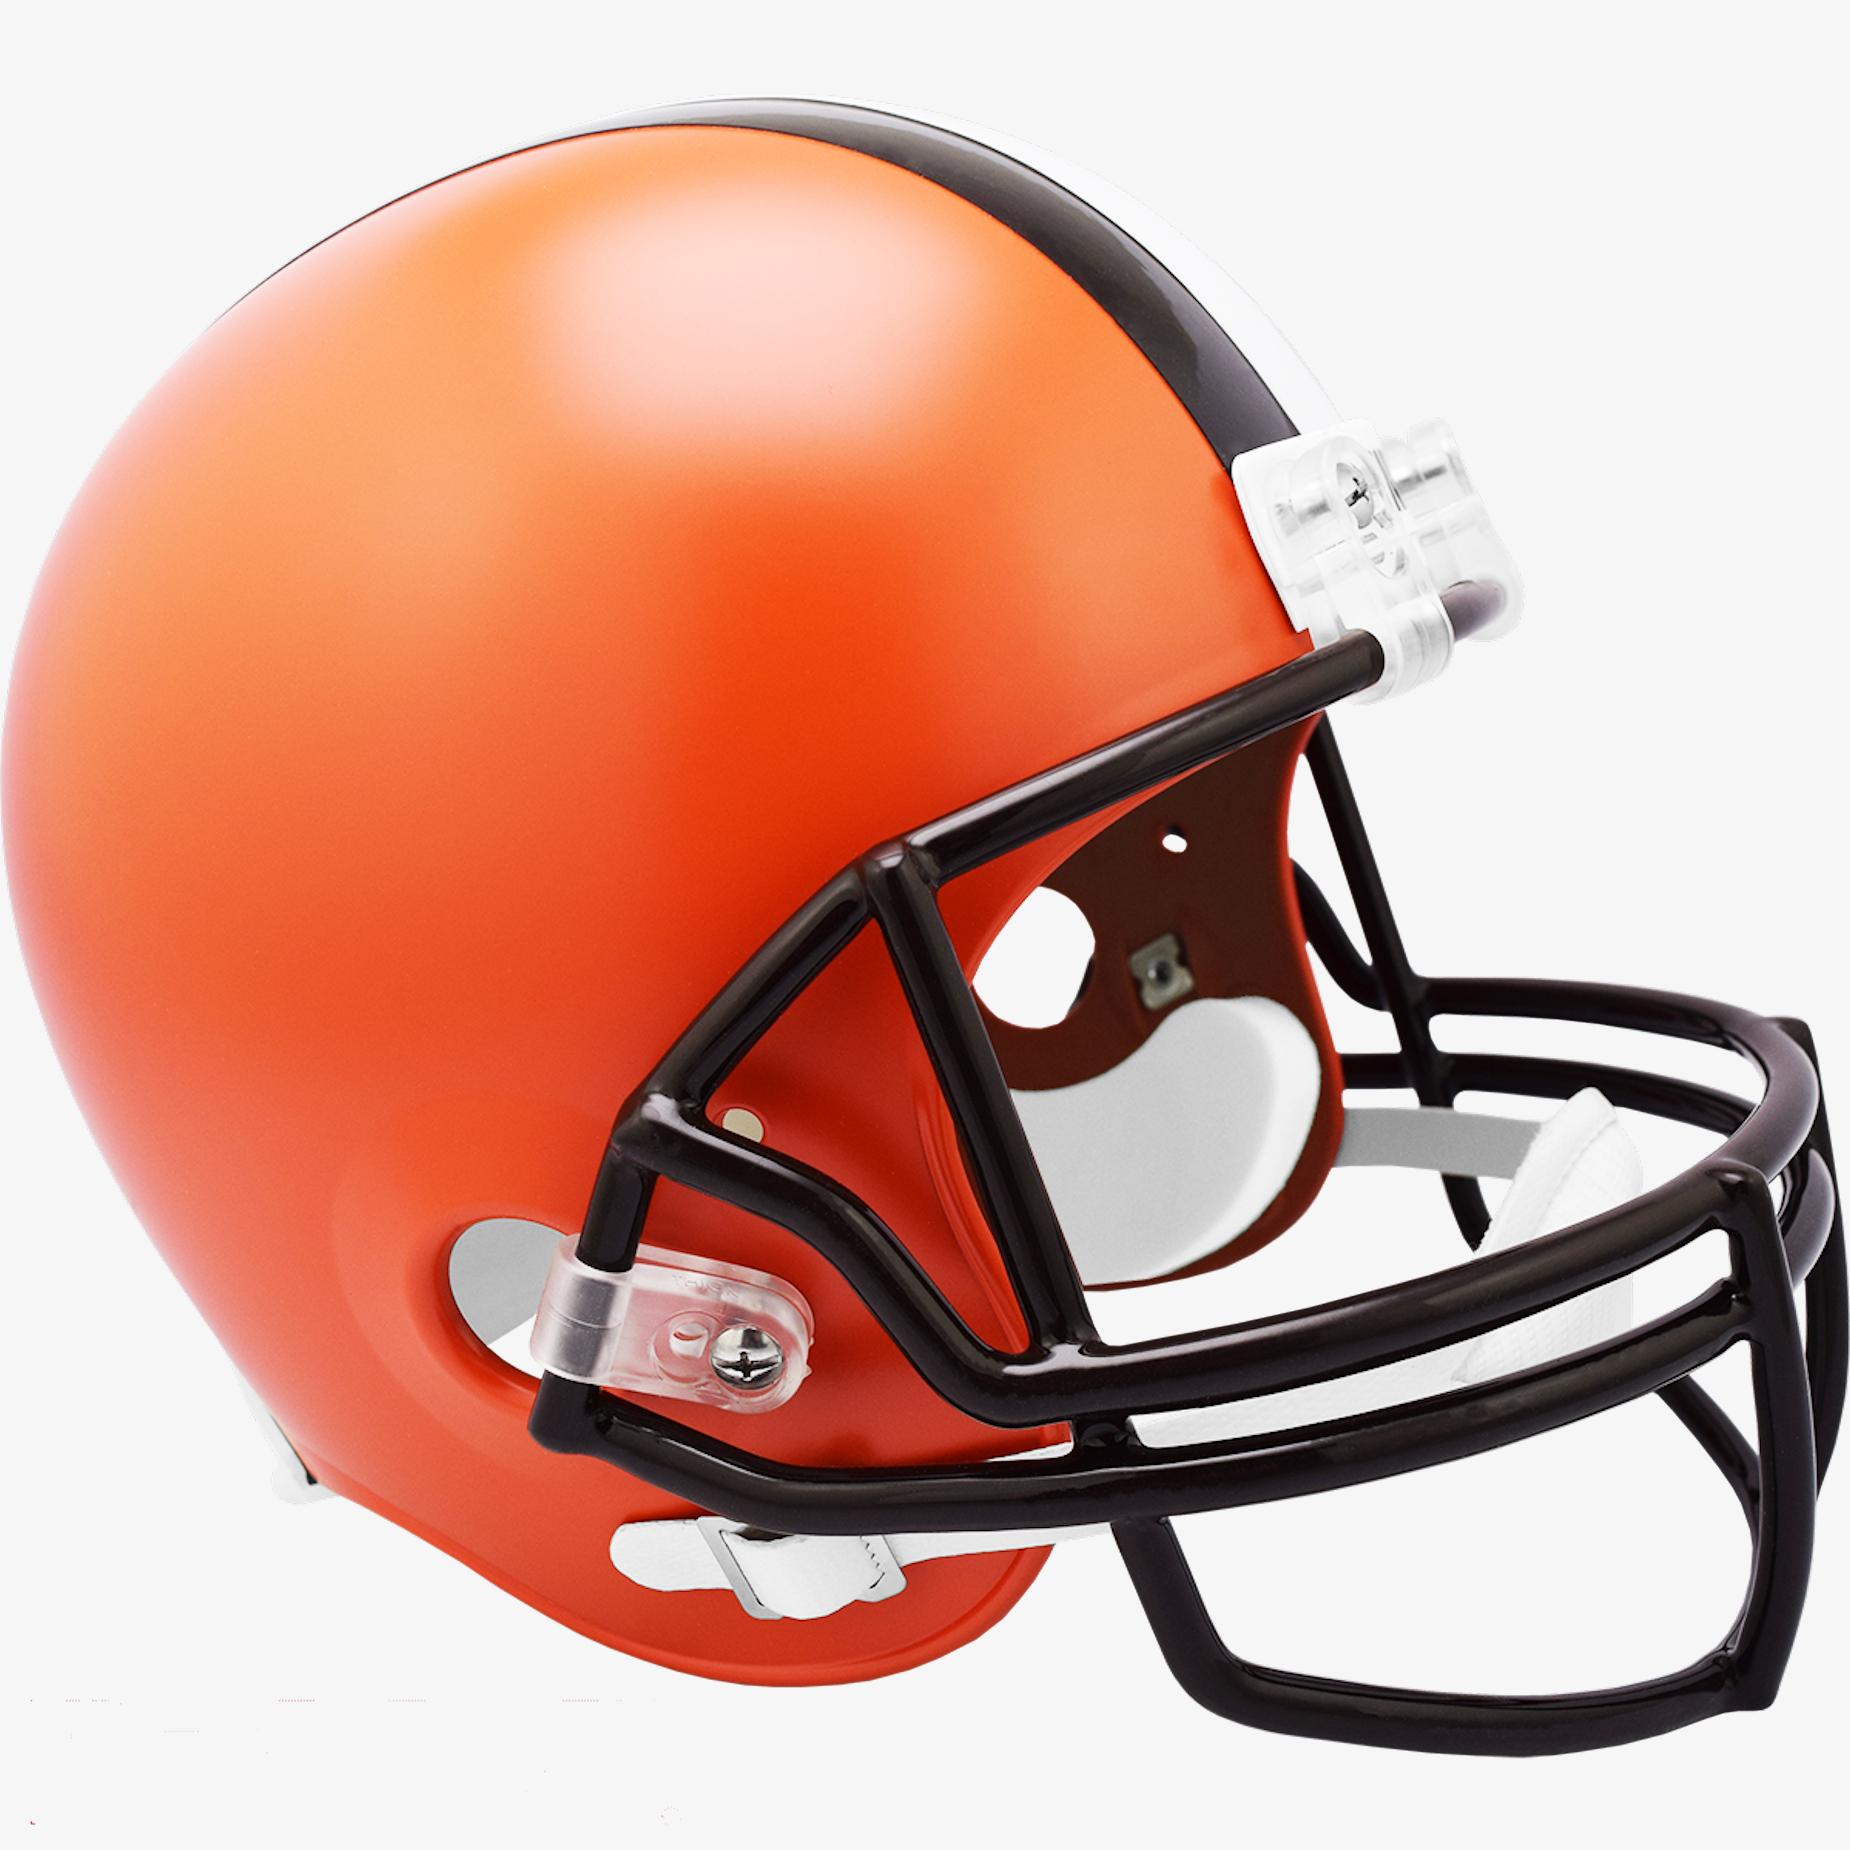 Cleveland Browns Full Size Replica Football Helmet <B>NEW 2020!</B>